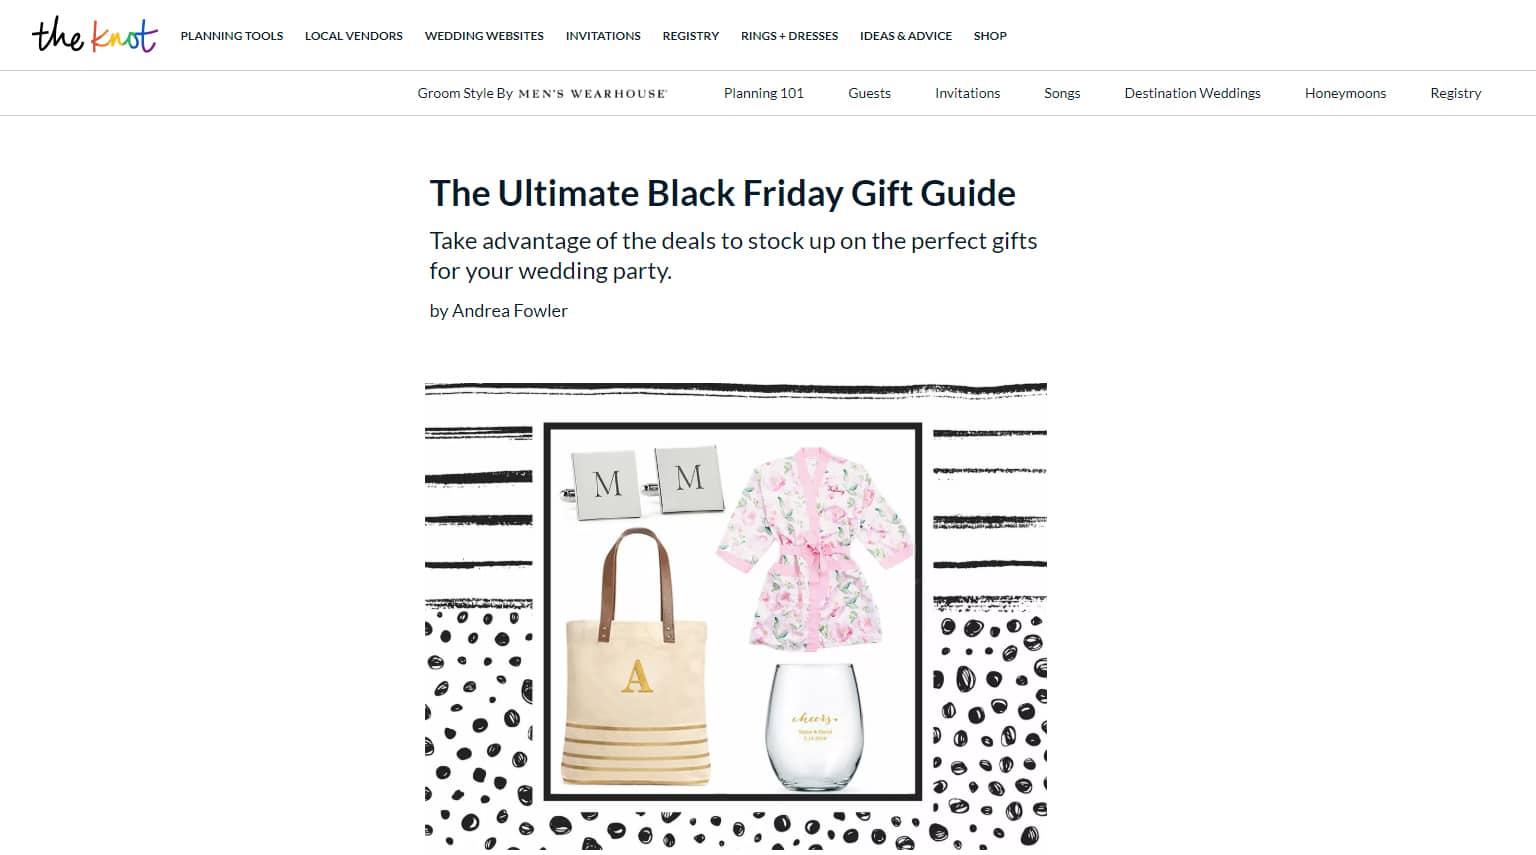 Gift guide for black friday